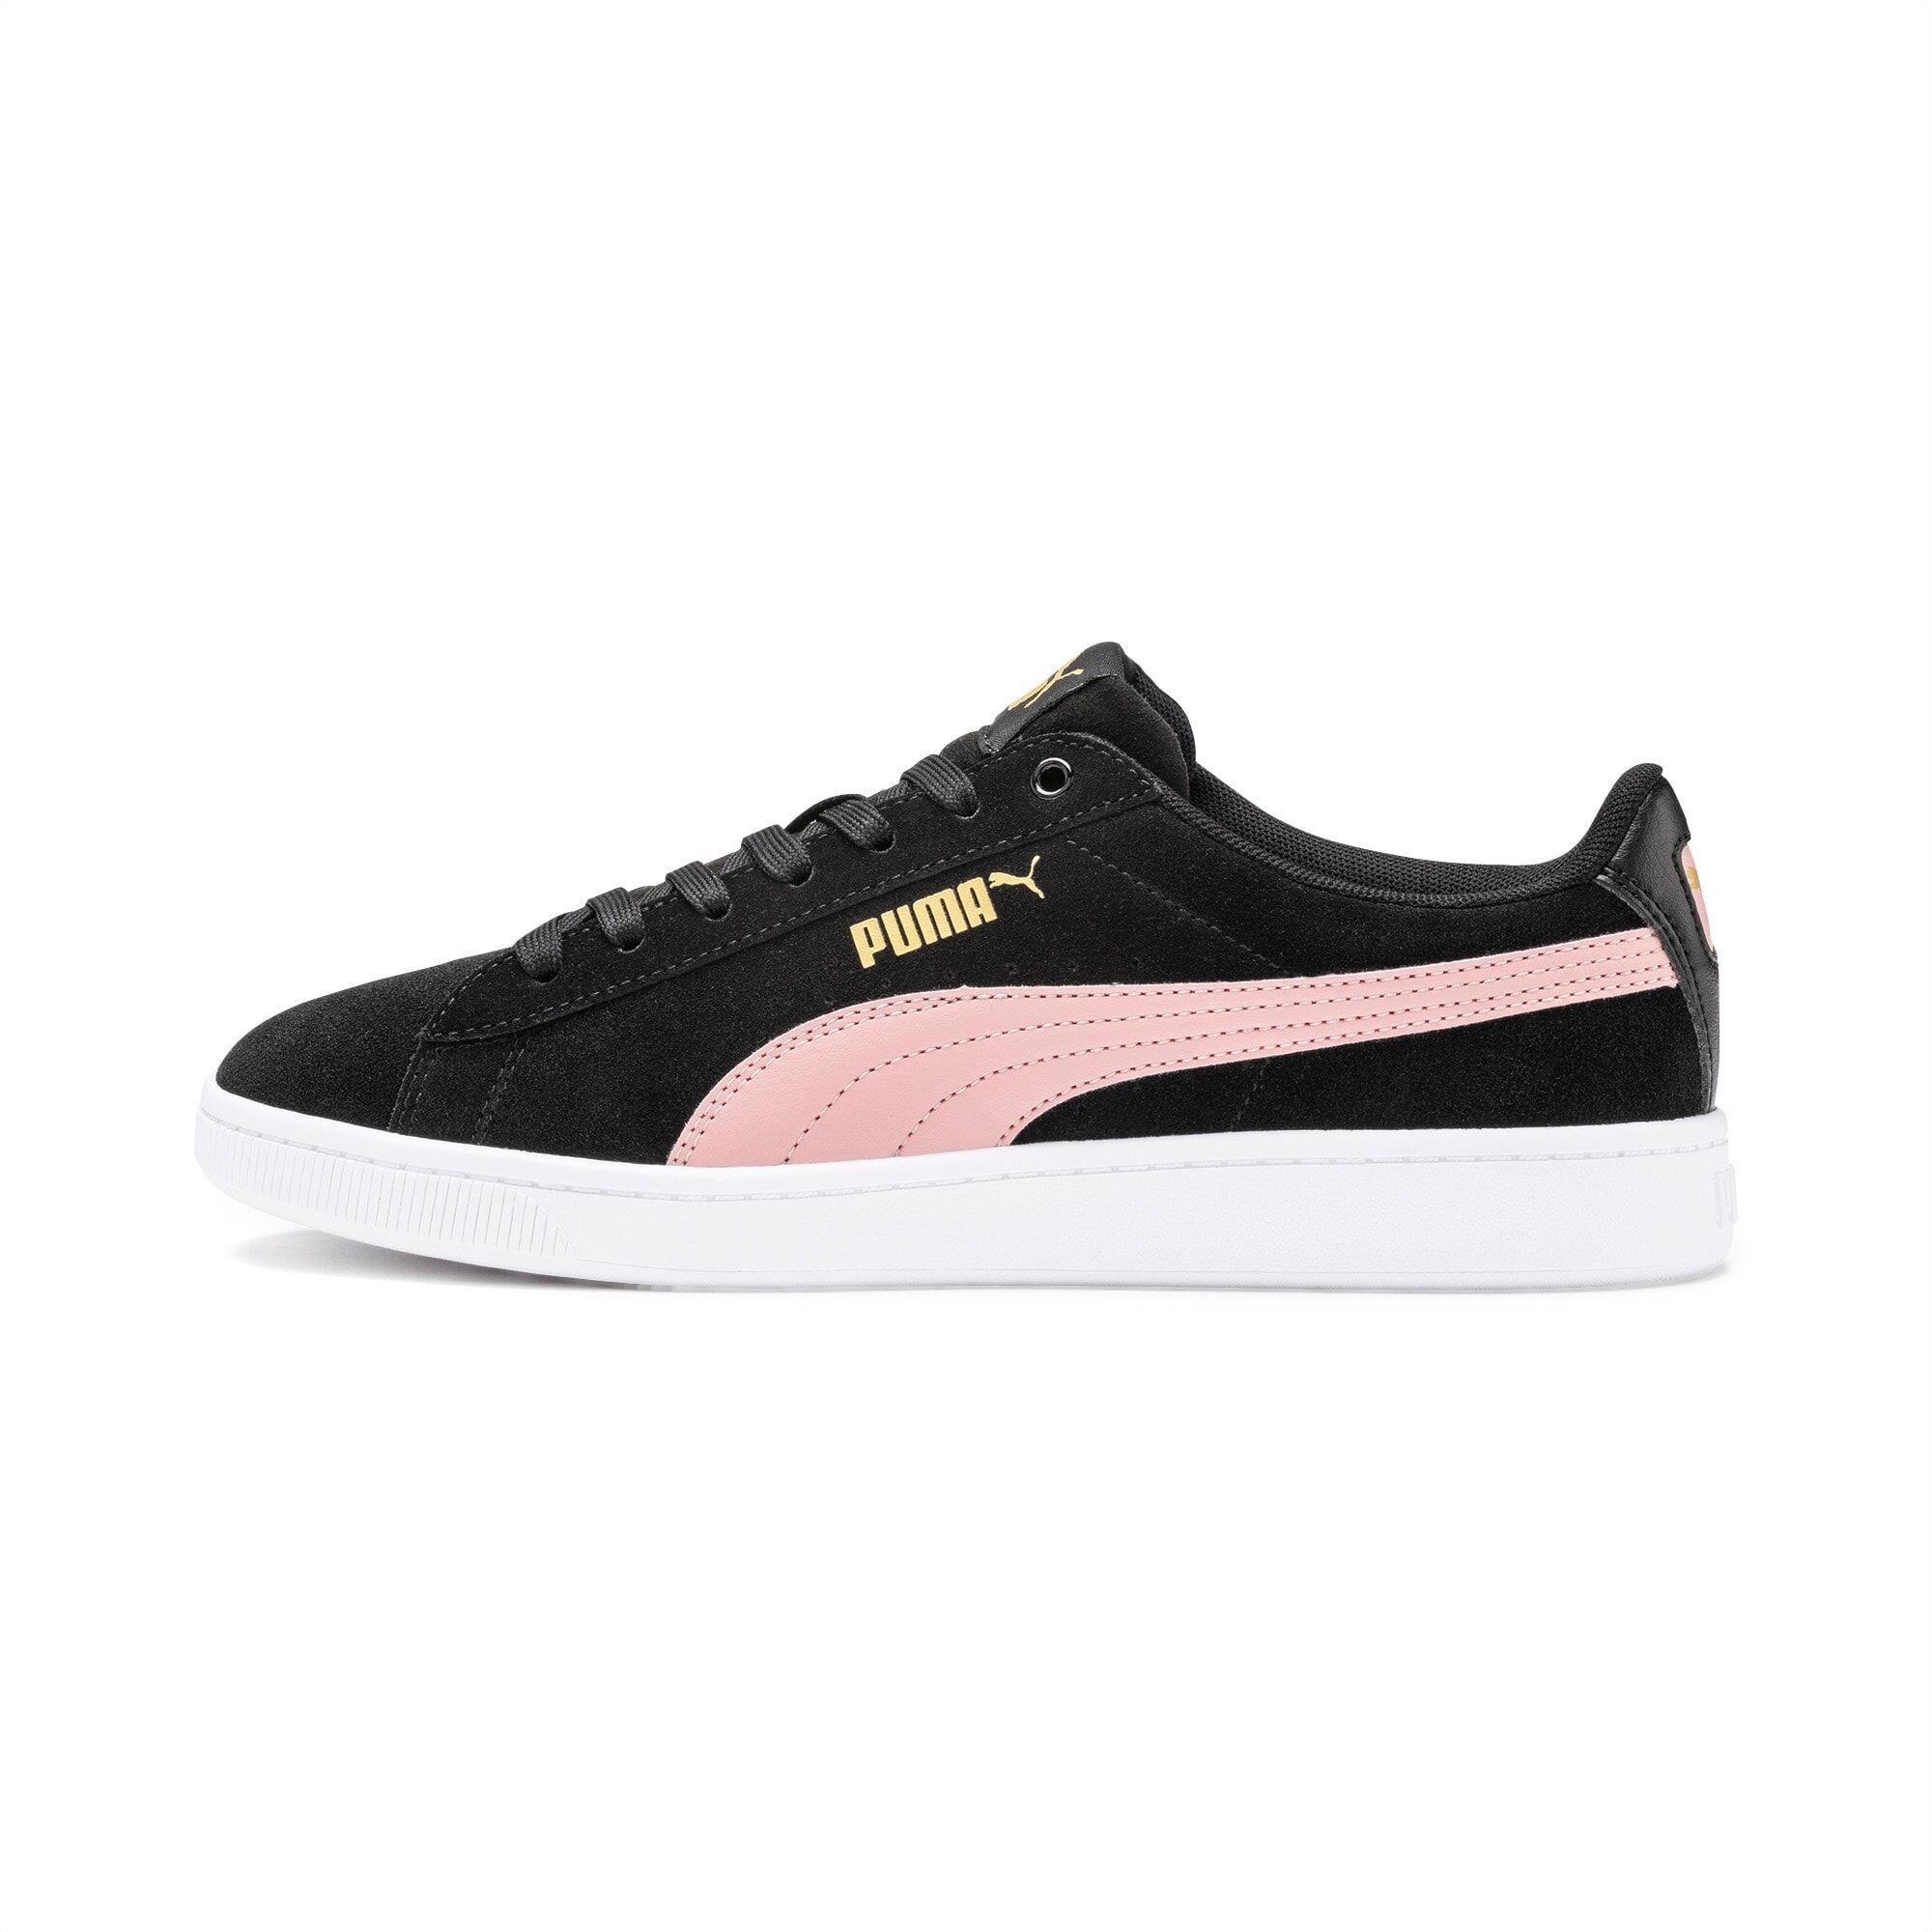 PUMA Chaussure Basket Vikky v2 pour Femme, Blanc/Rose/Noir, Taille 42.5, Chaussures